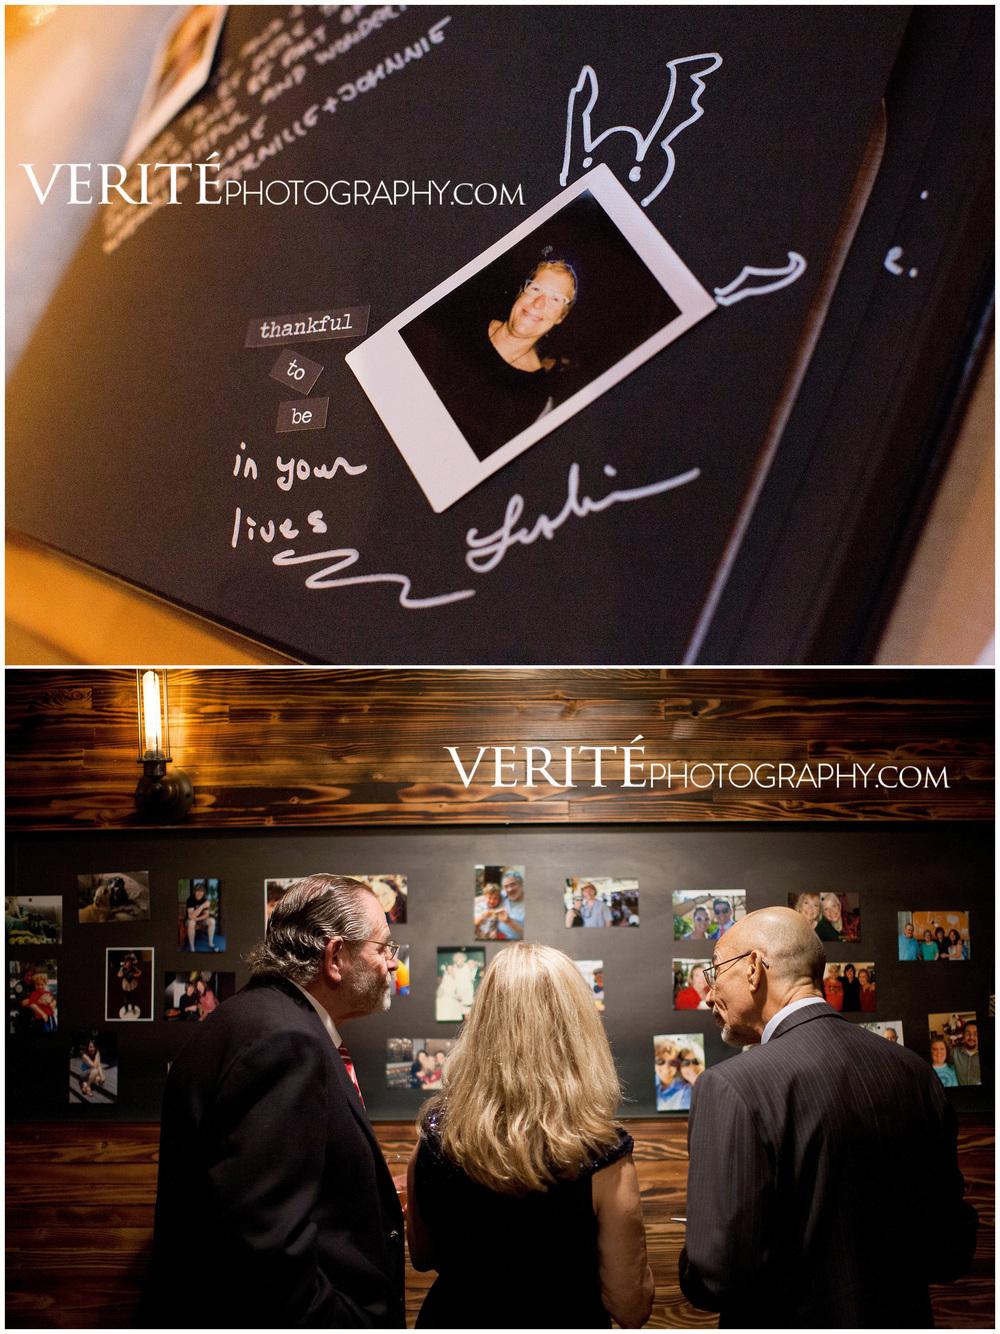 SusMich 2015 veritephotography 419.jpg